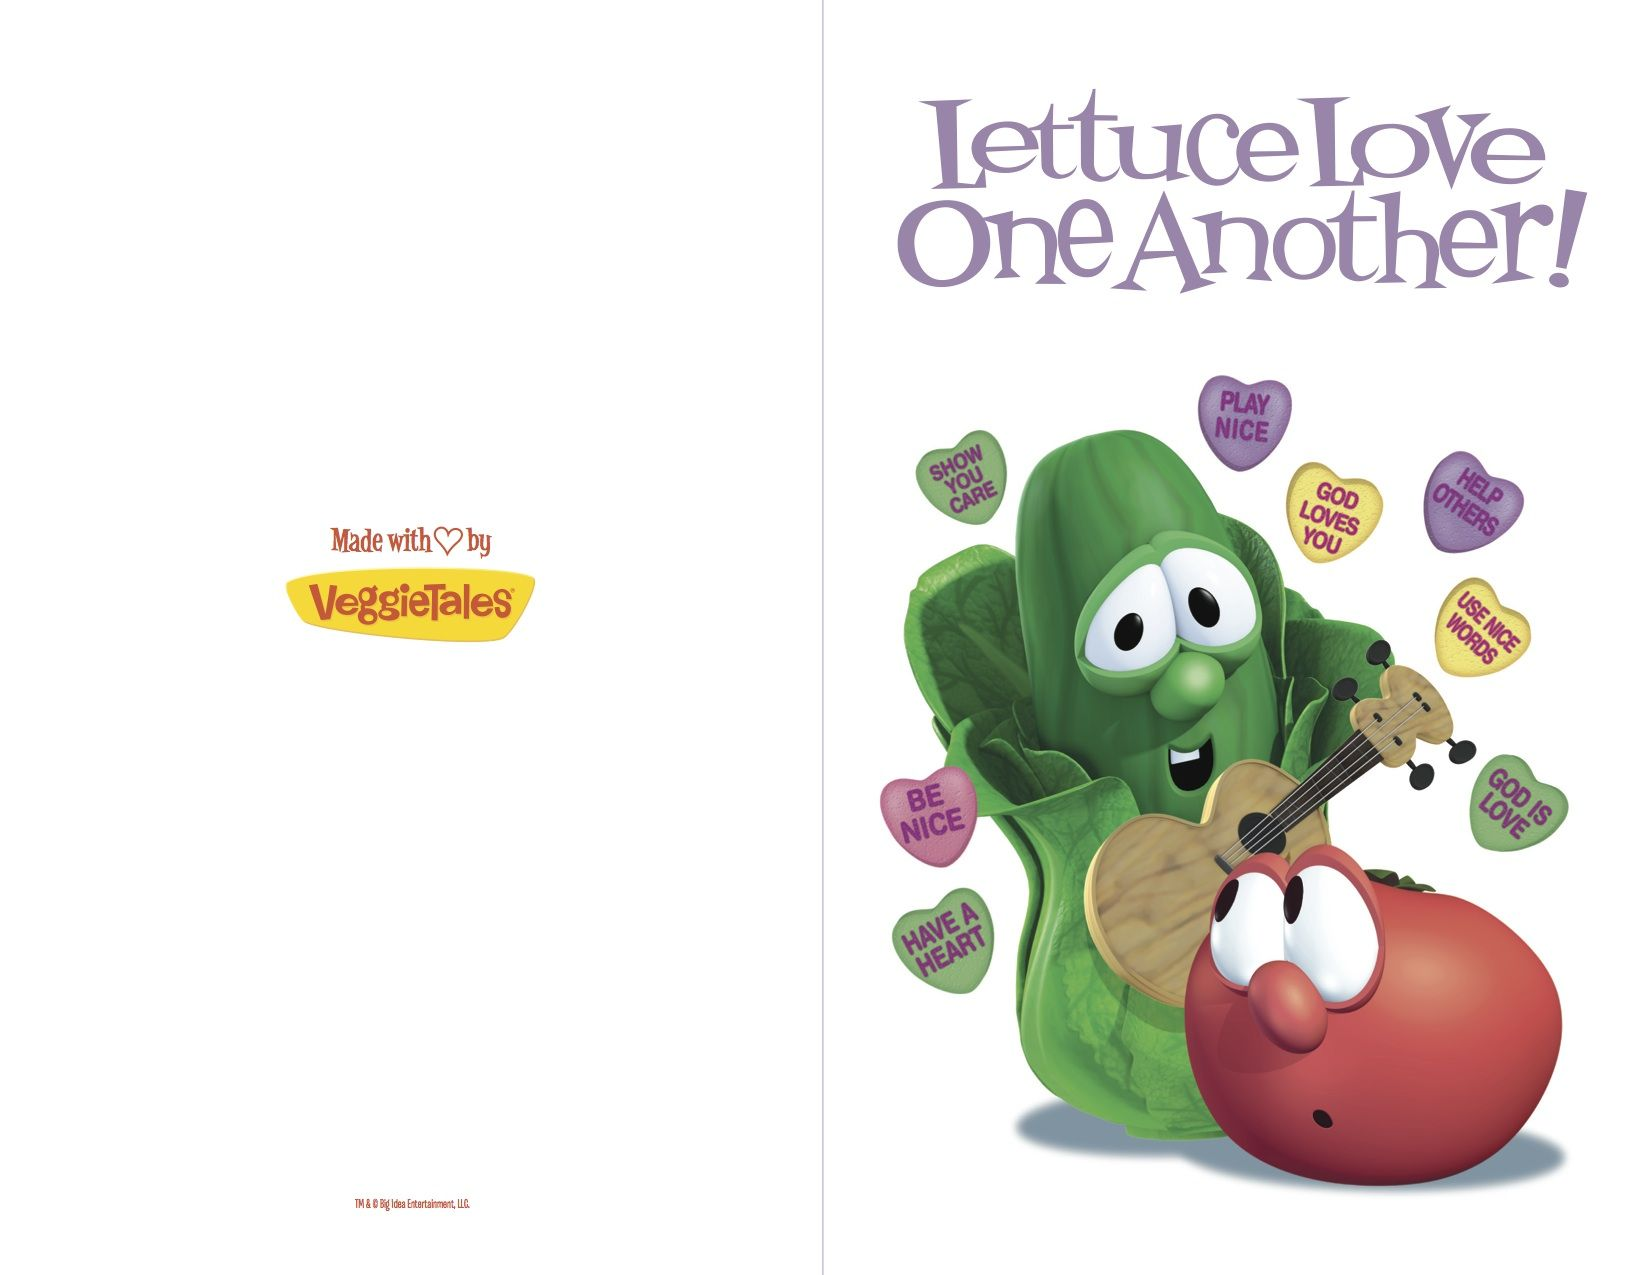 Valentines Day Card! #love #VeggieTales   VeggieTales   Pinterest ...